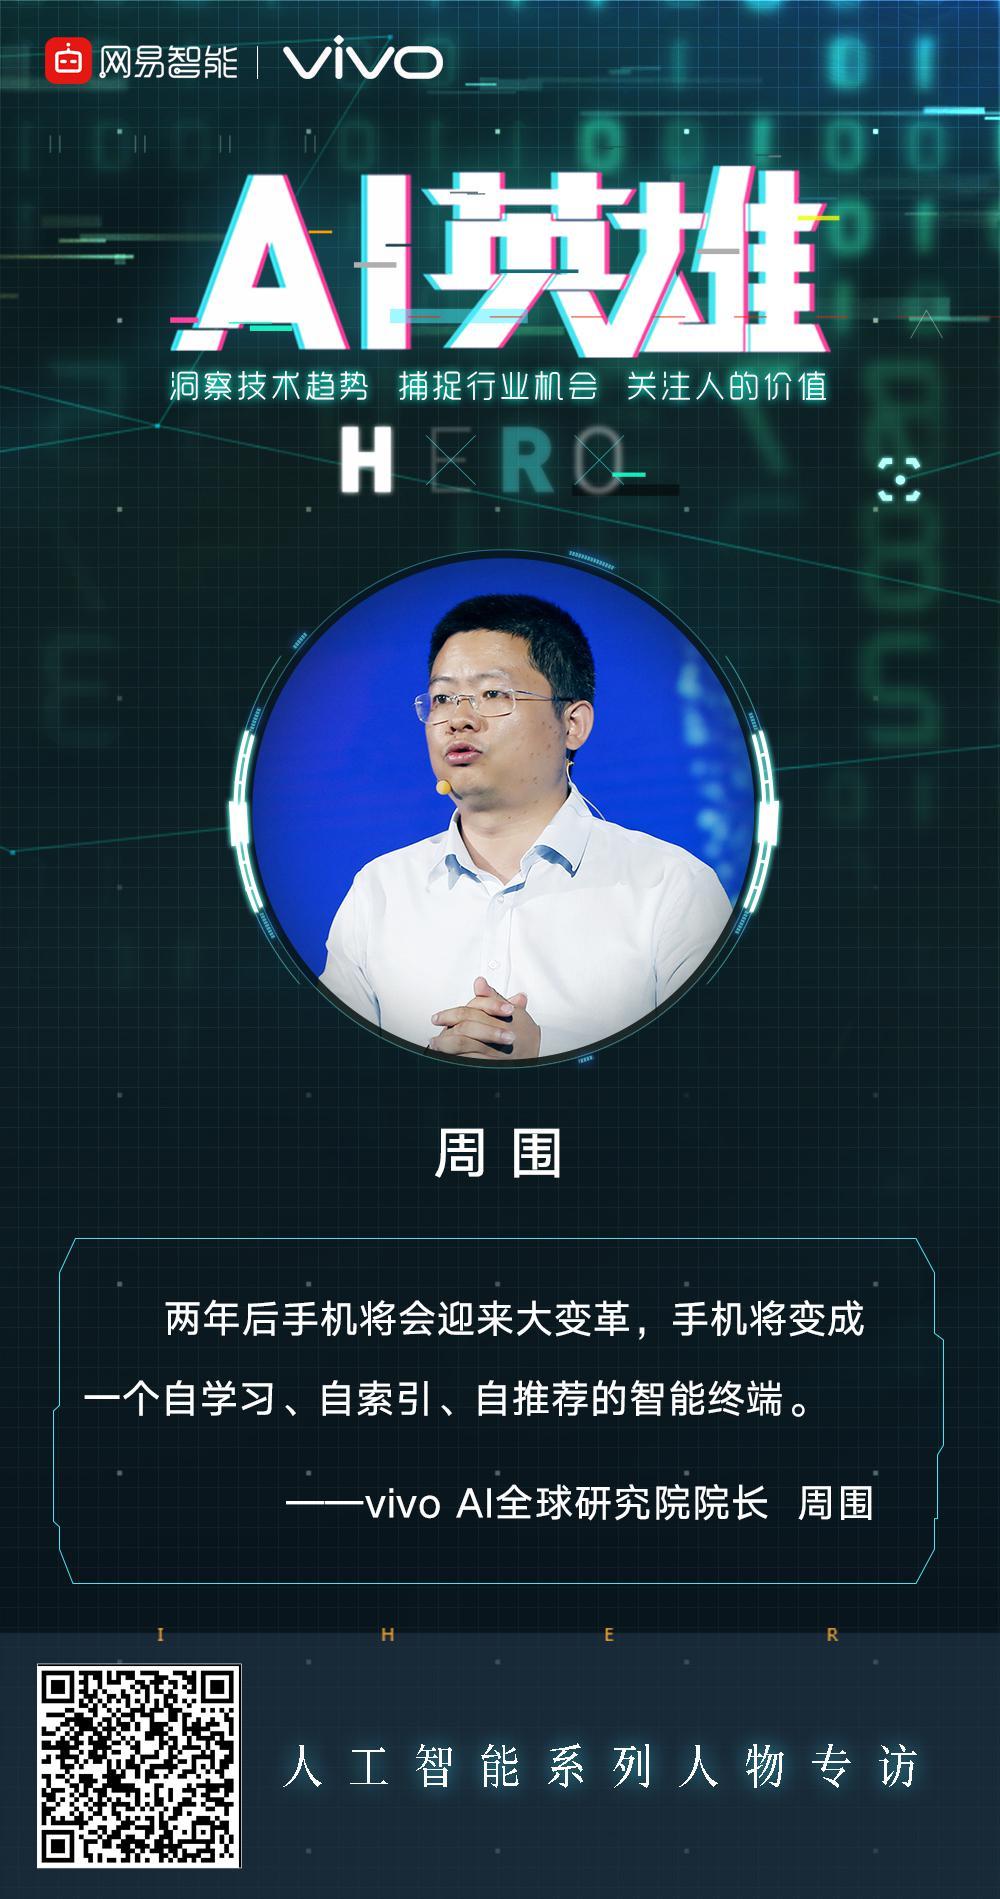 AI英雄|专访vivo周围:手机行业的下一站是AI与IoT